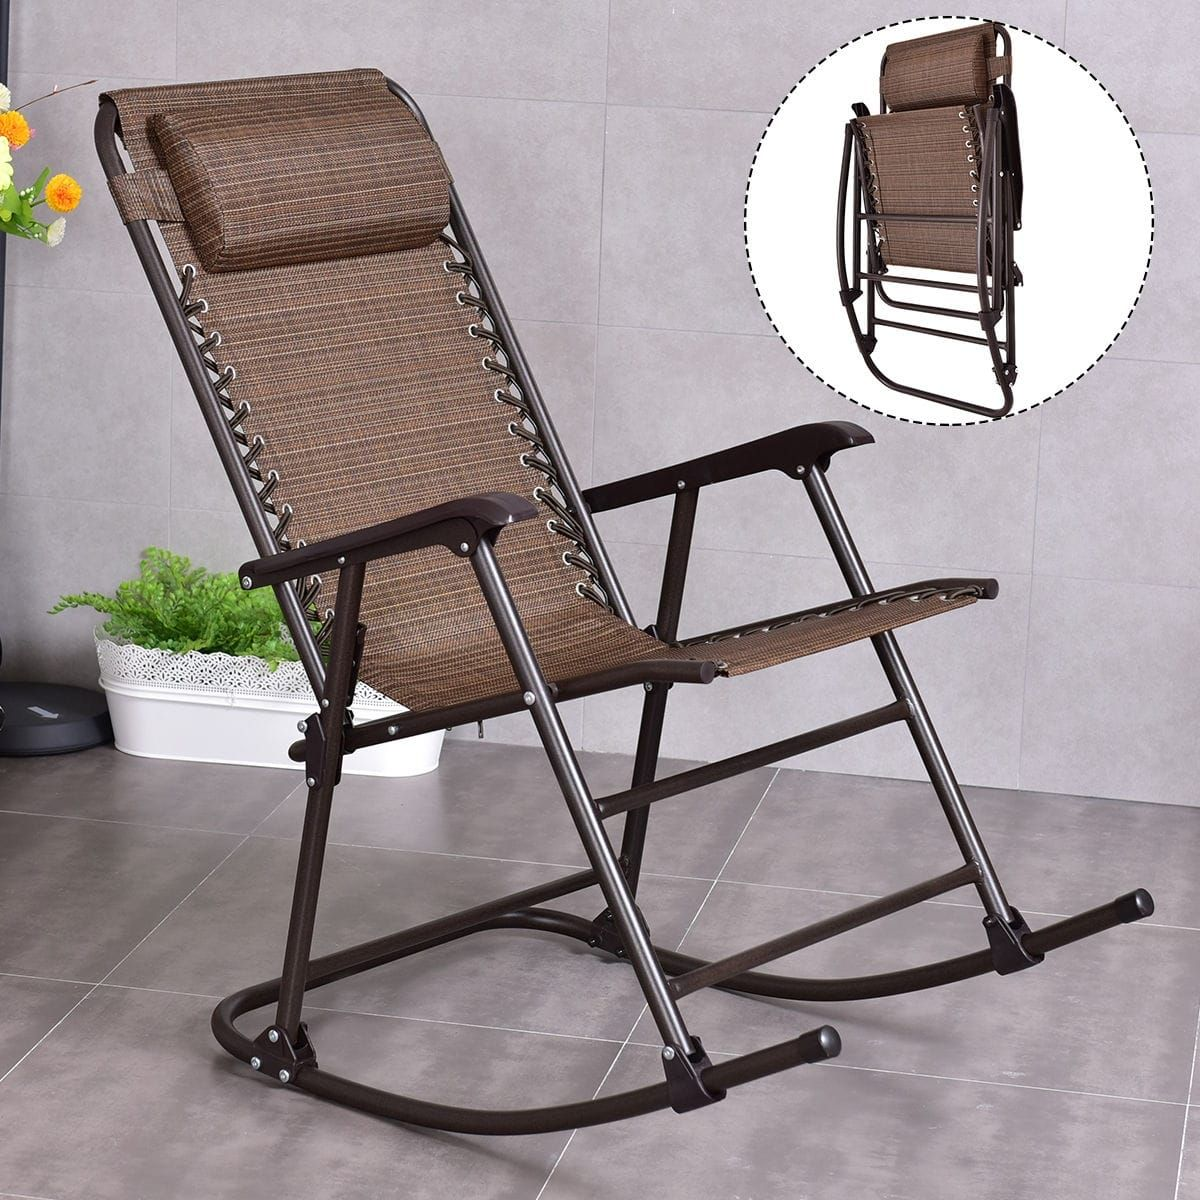 STRONGBACK Low Gravity Beach Chair Heavy Duty Portable